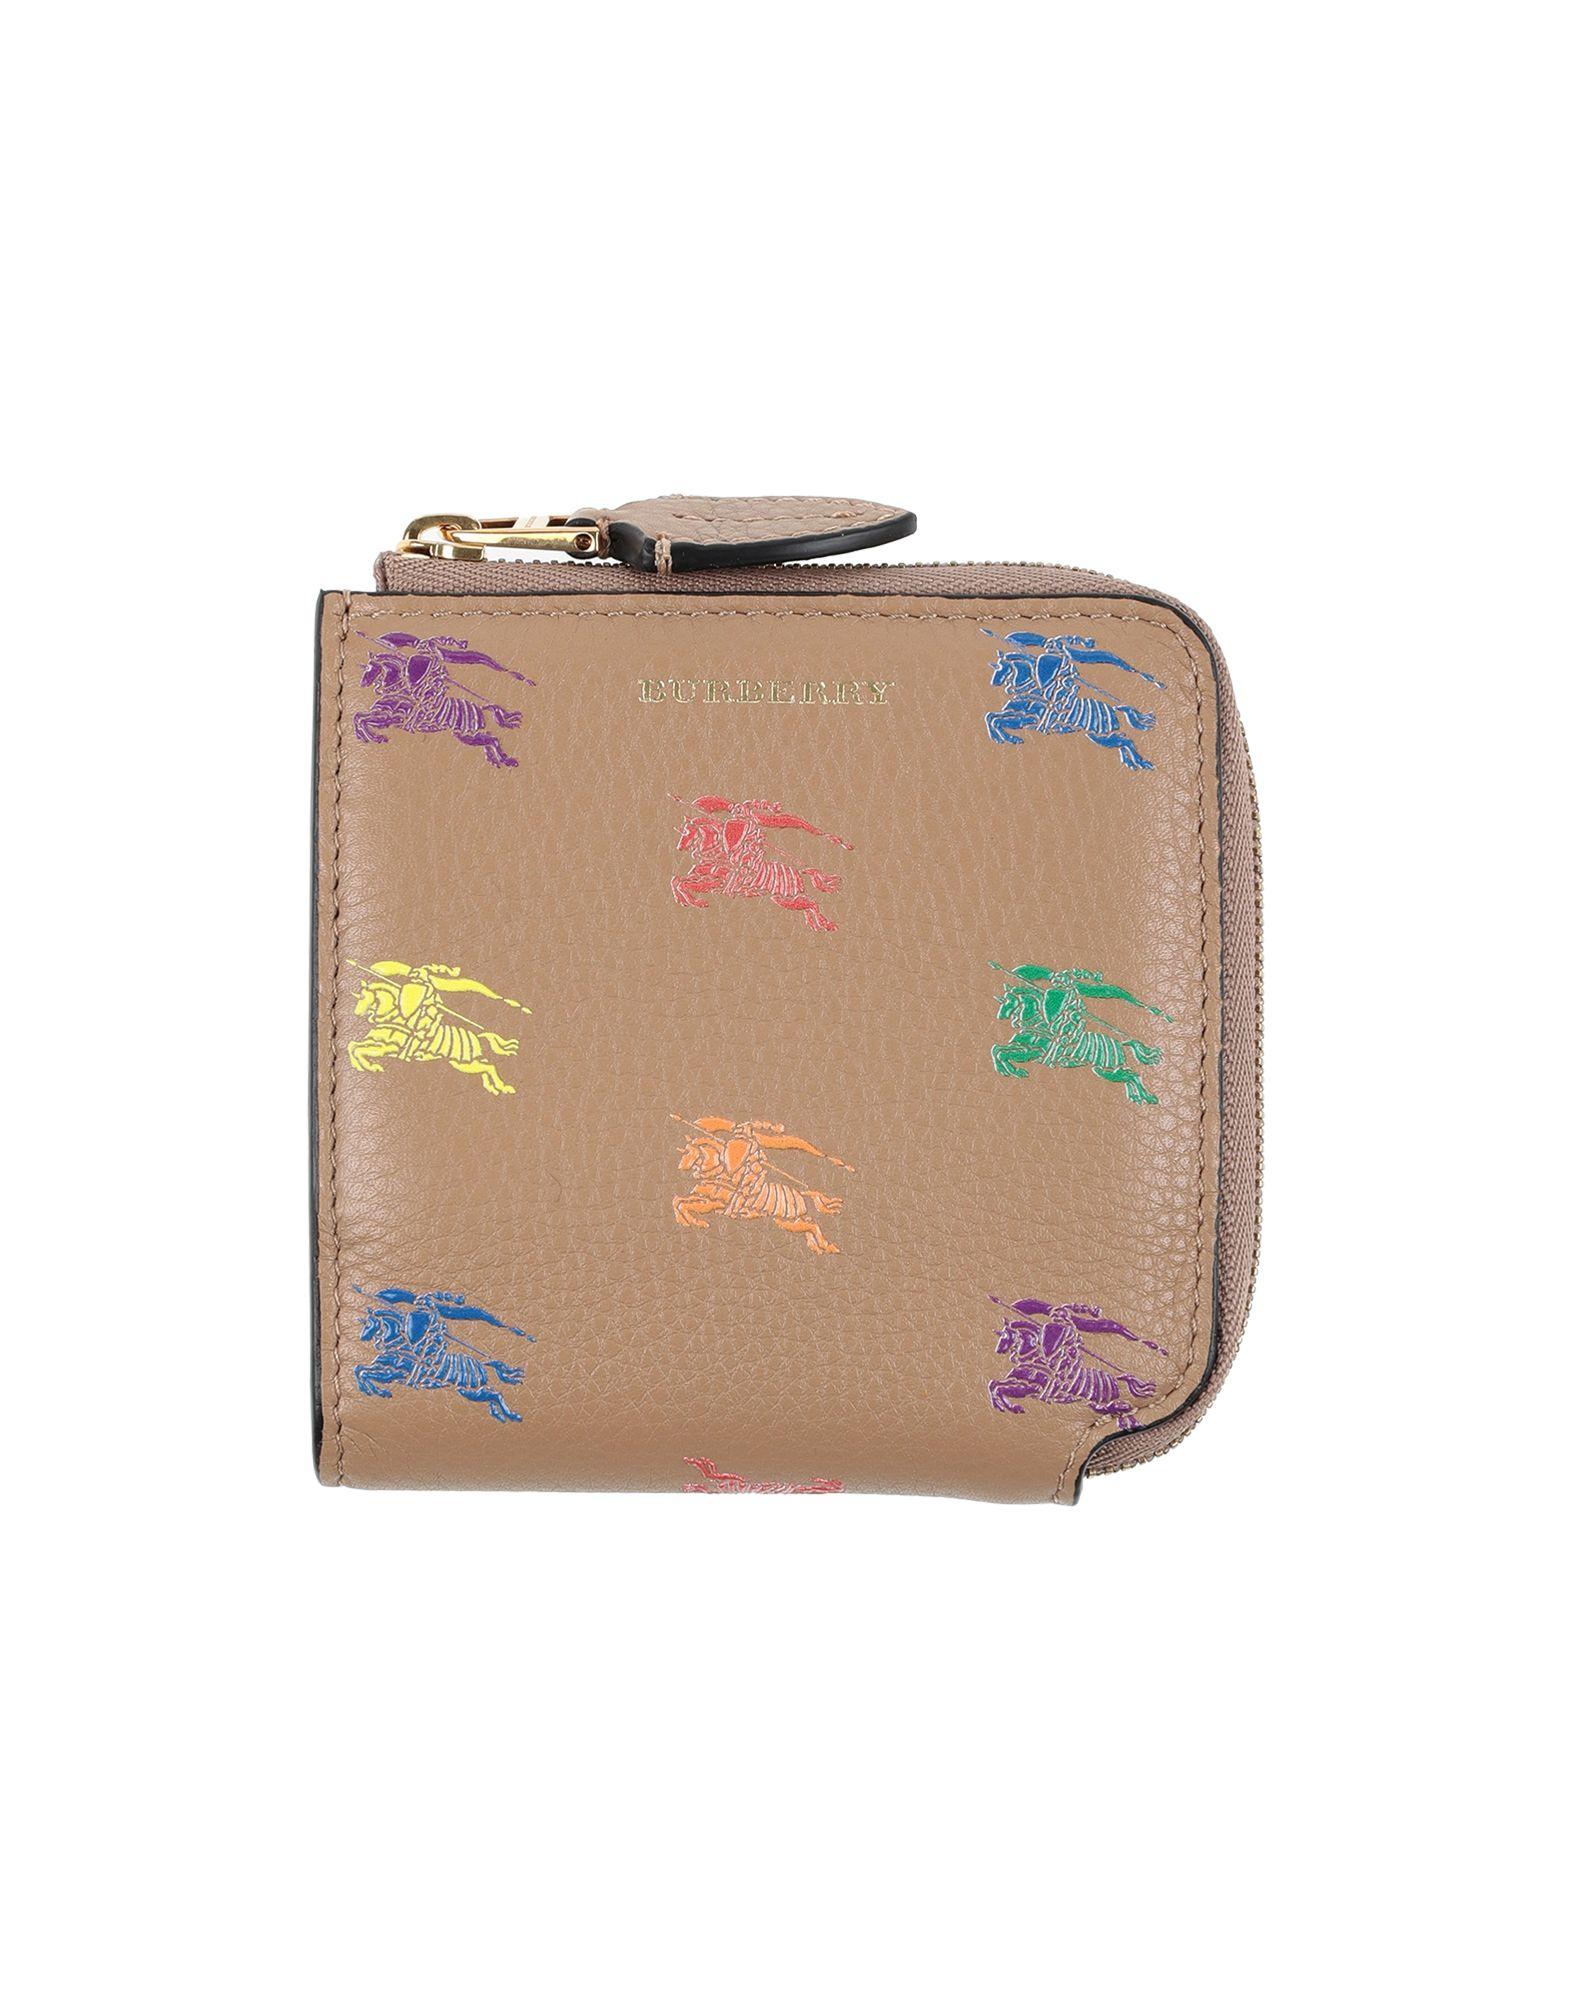 3d71f2918973 バーバリー(BURBERRY) 財布 | 通販・人気ランキング - 価格.com